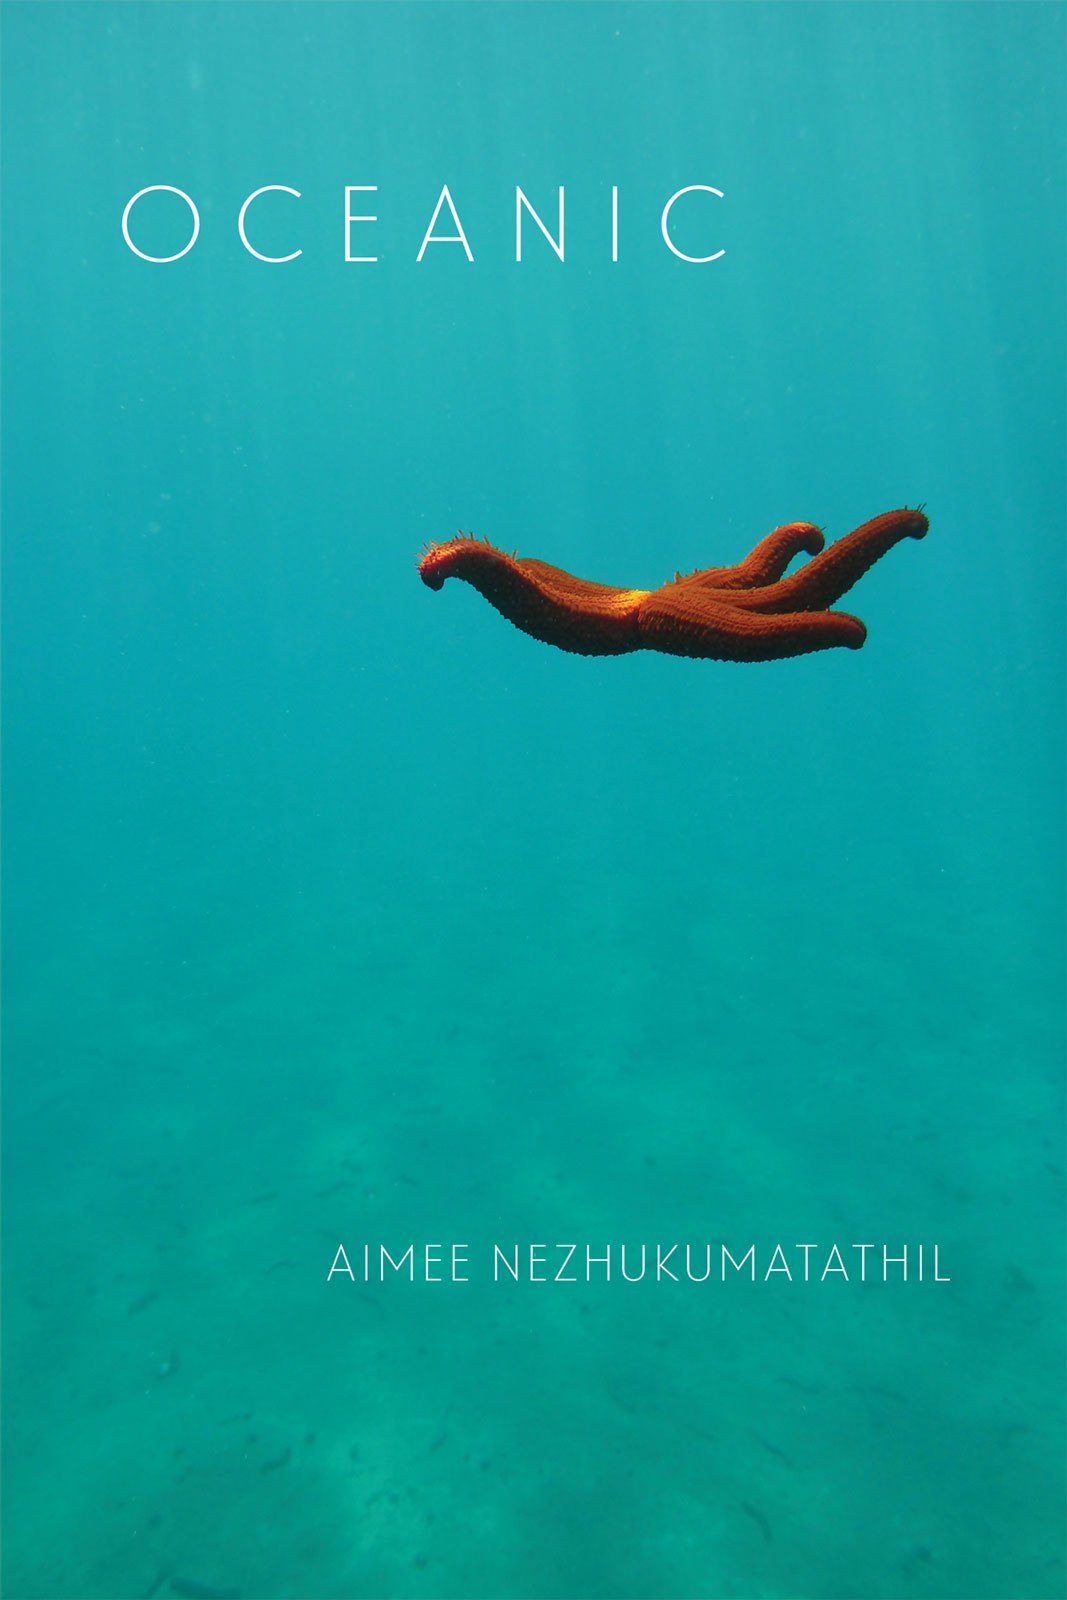 Image result for oceanic aimee nezhukumatathil